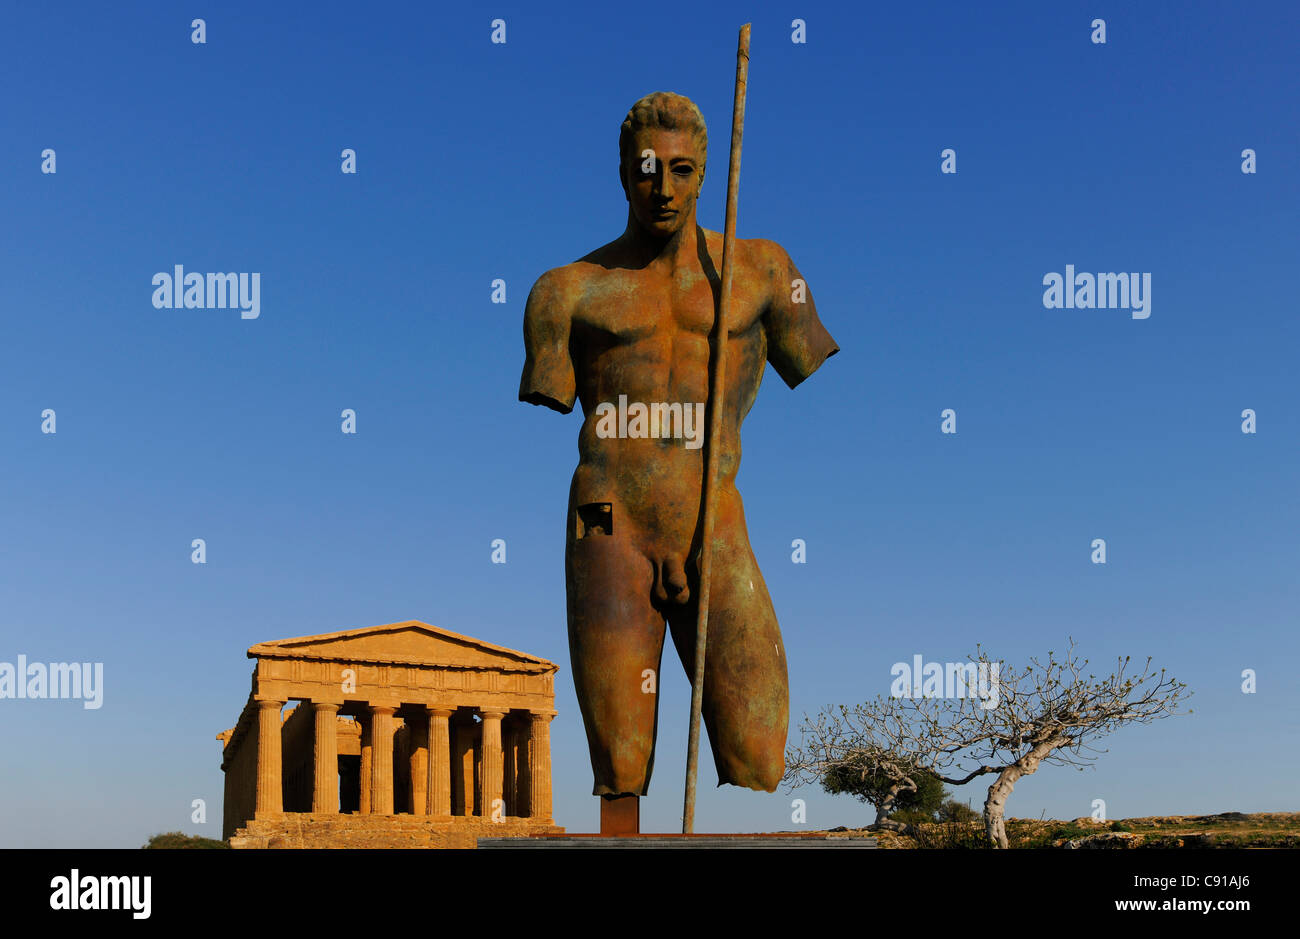 Sculpture by Igor Mitoraj, Daedalus, Concordia temple, Valle dei Templi, Agrigento, Sicily, Italy - Stock Image